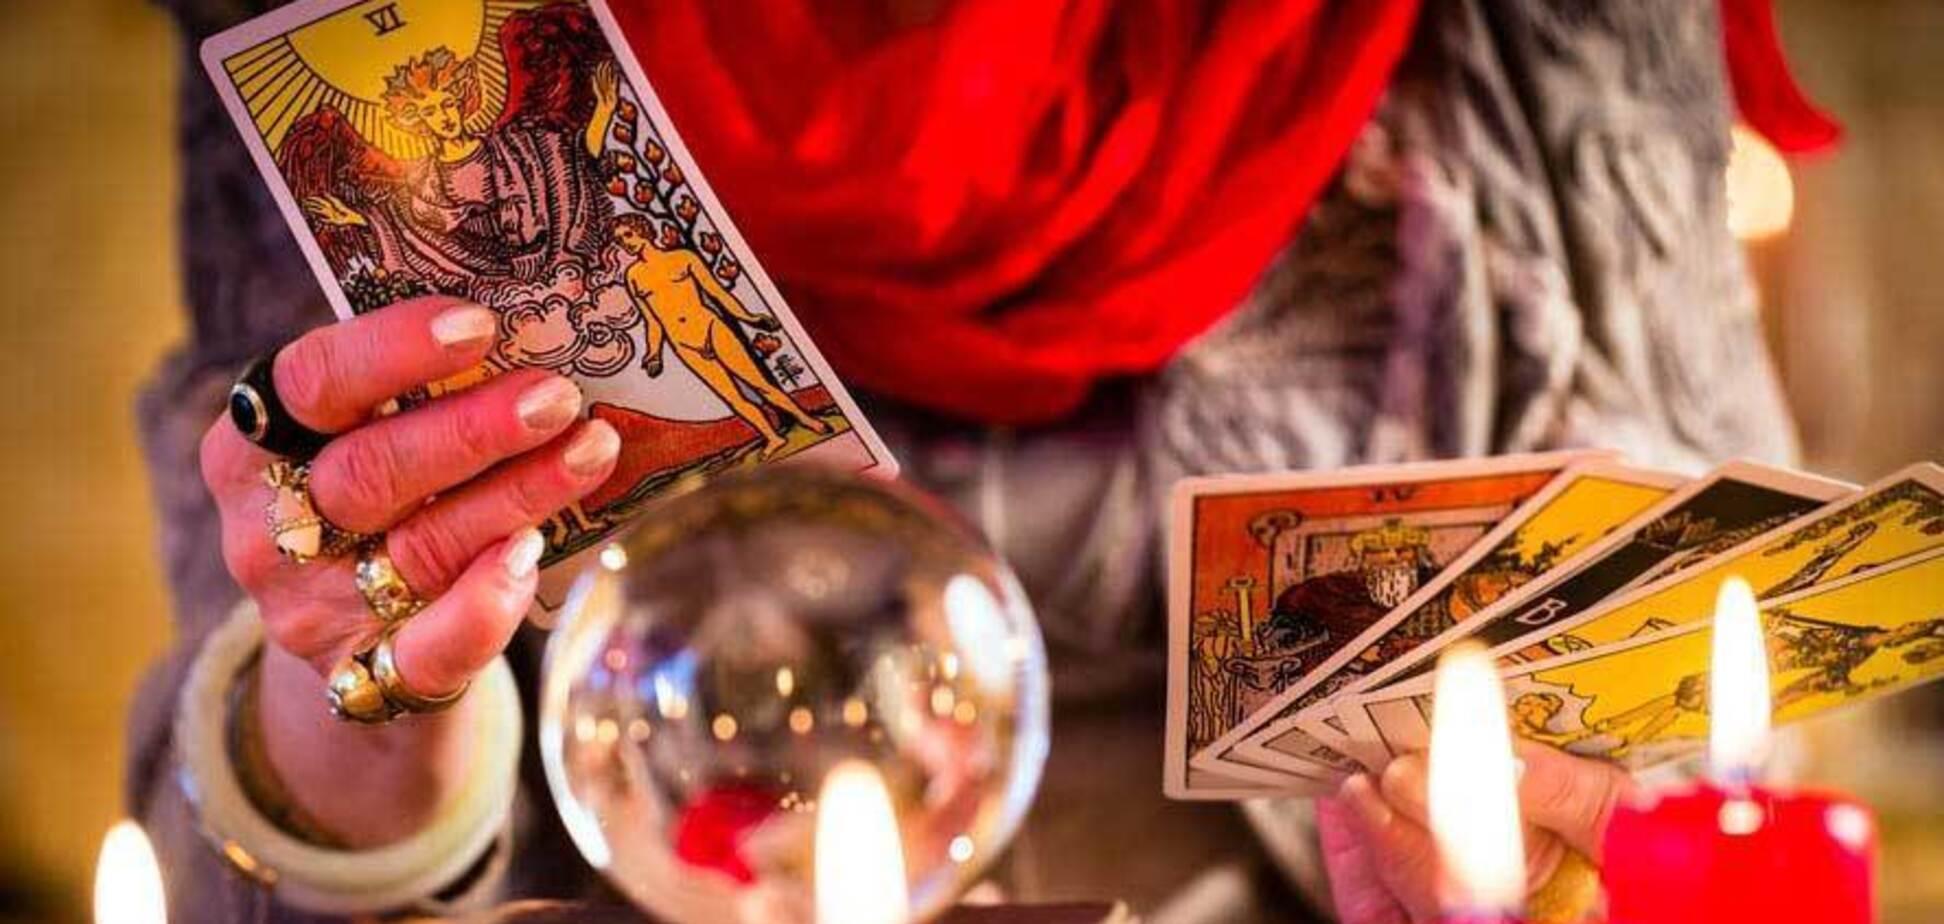 Гороскоп на 9 февраля для всех знаков Зодиака по картам Таро: кого ждет удача